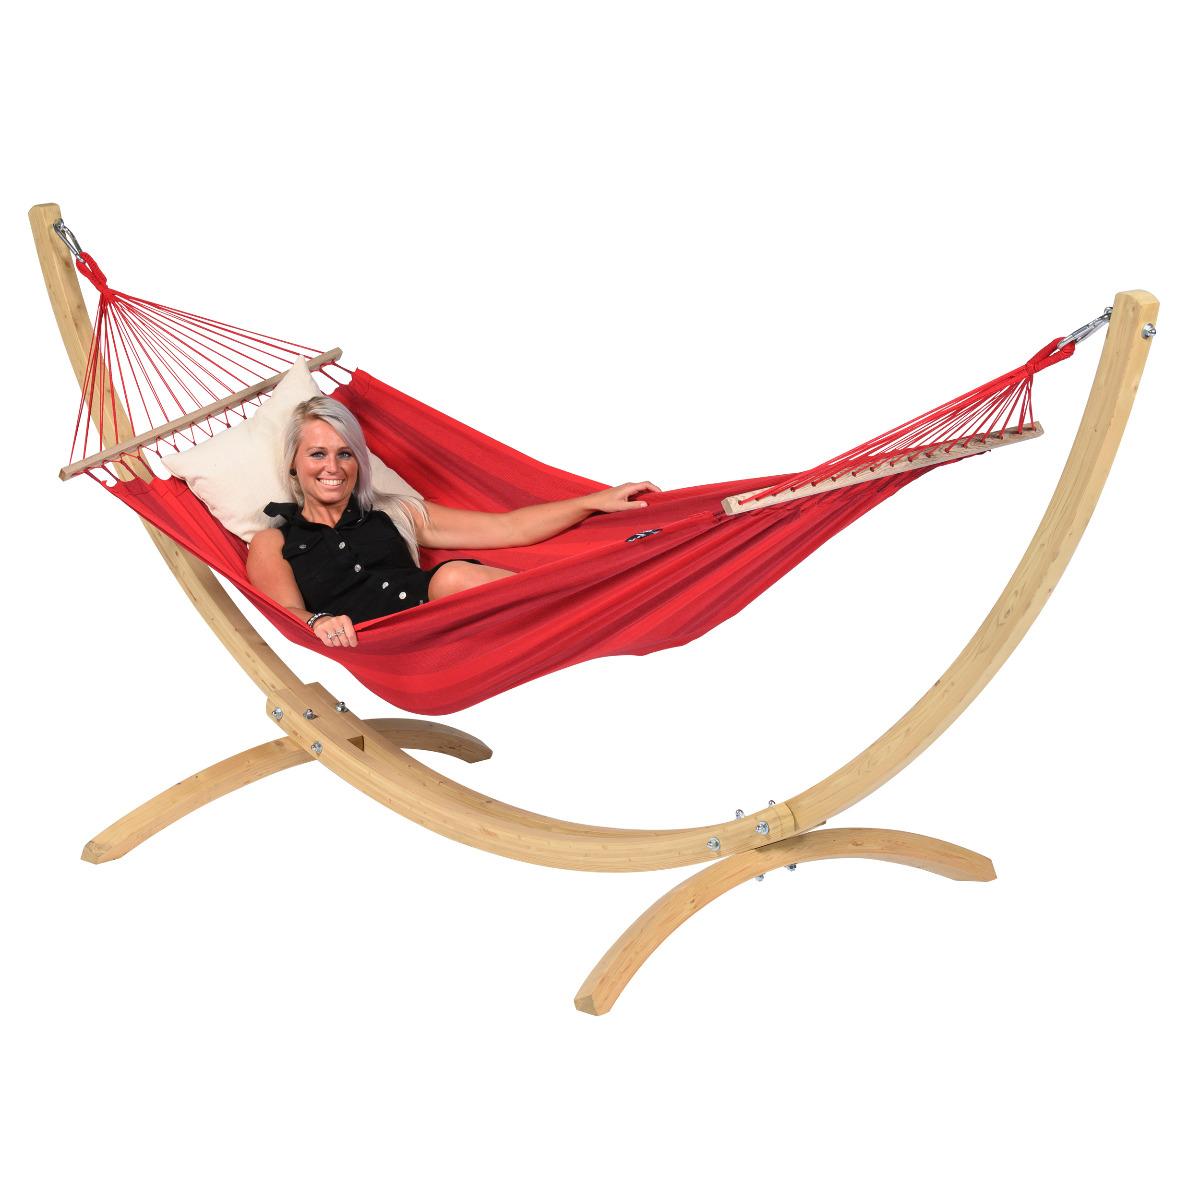 'Wood & Relax' Red E�npersoons Hangmatset - Rood - Tropilex �